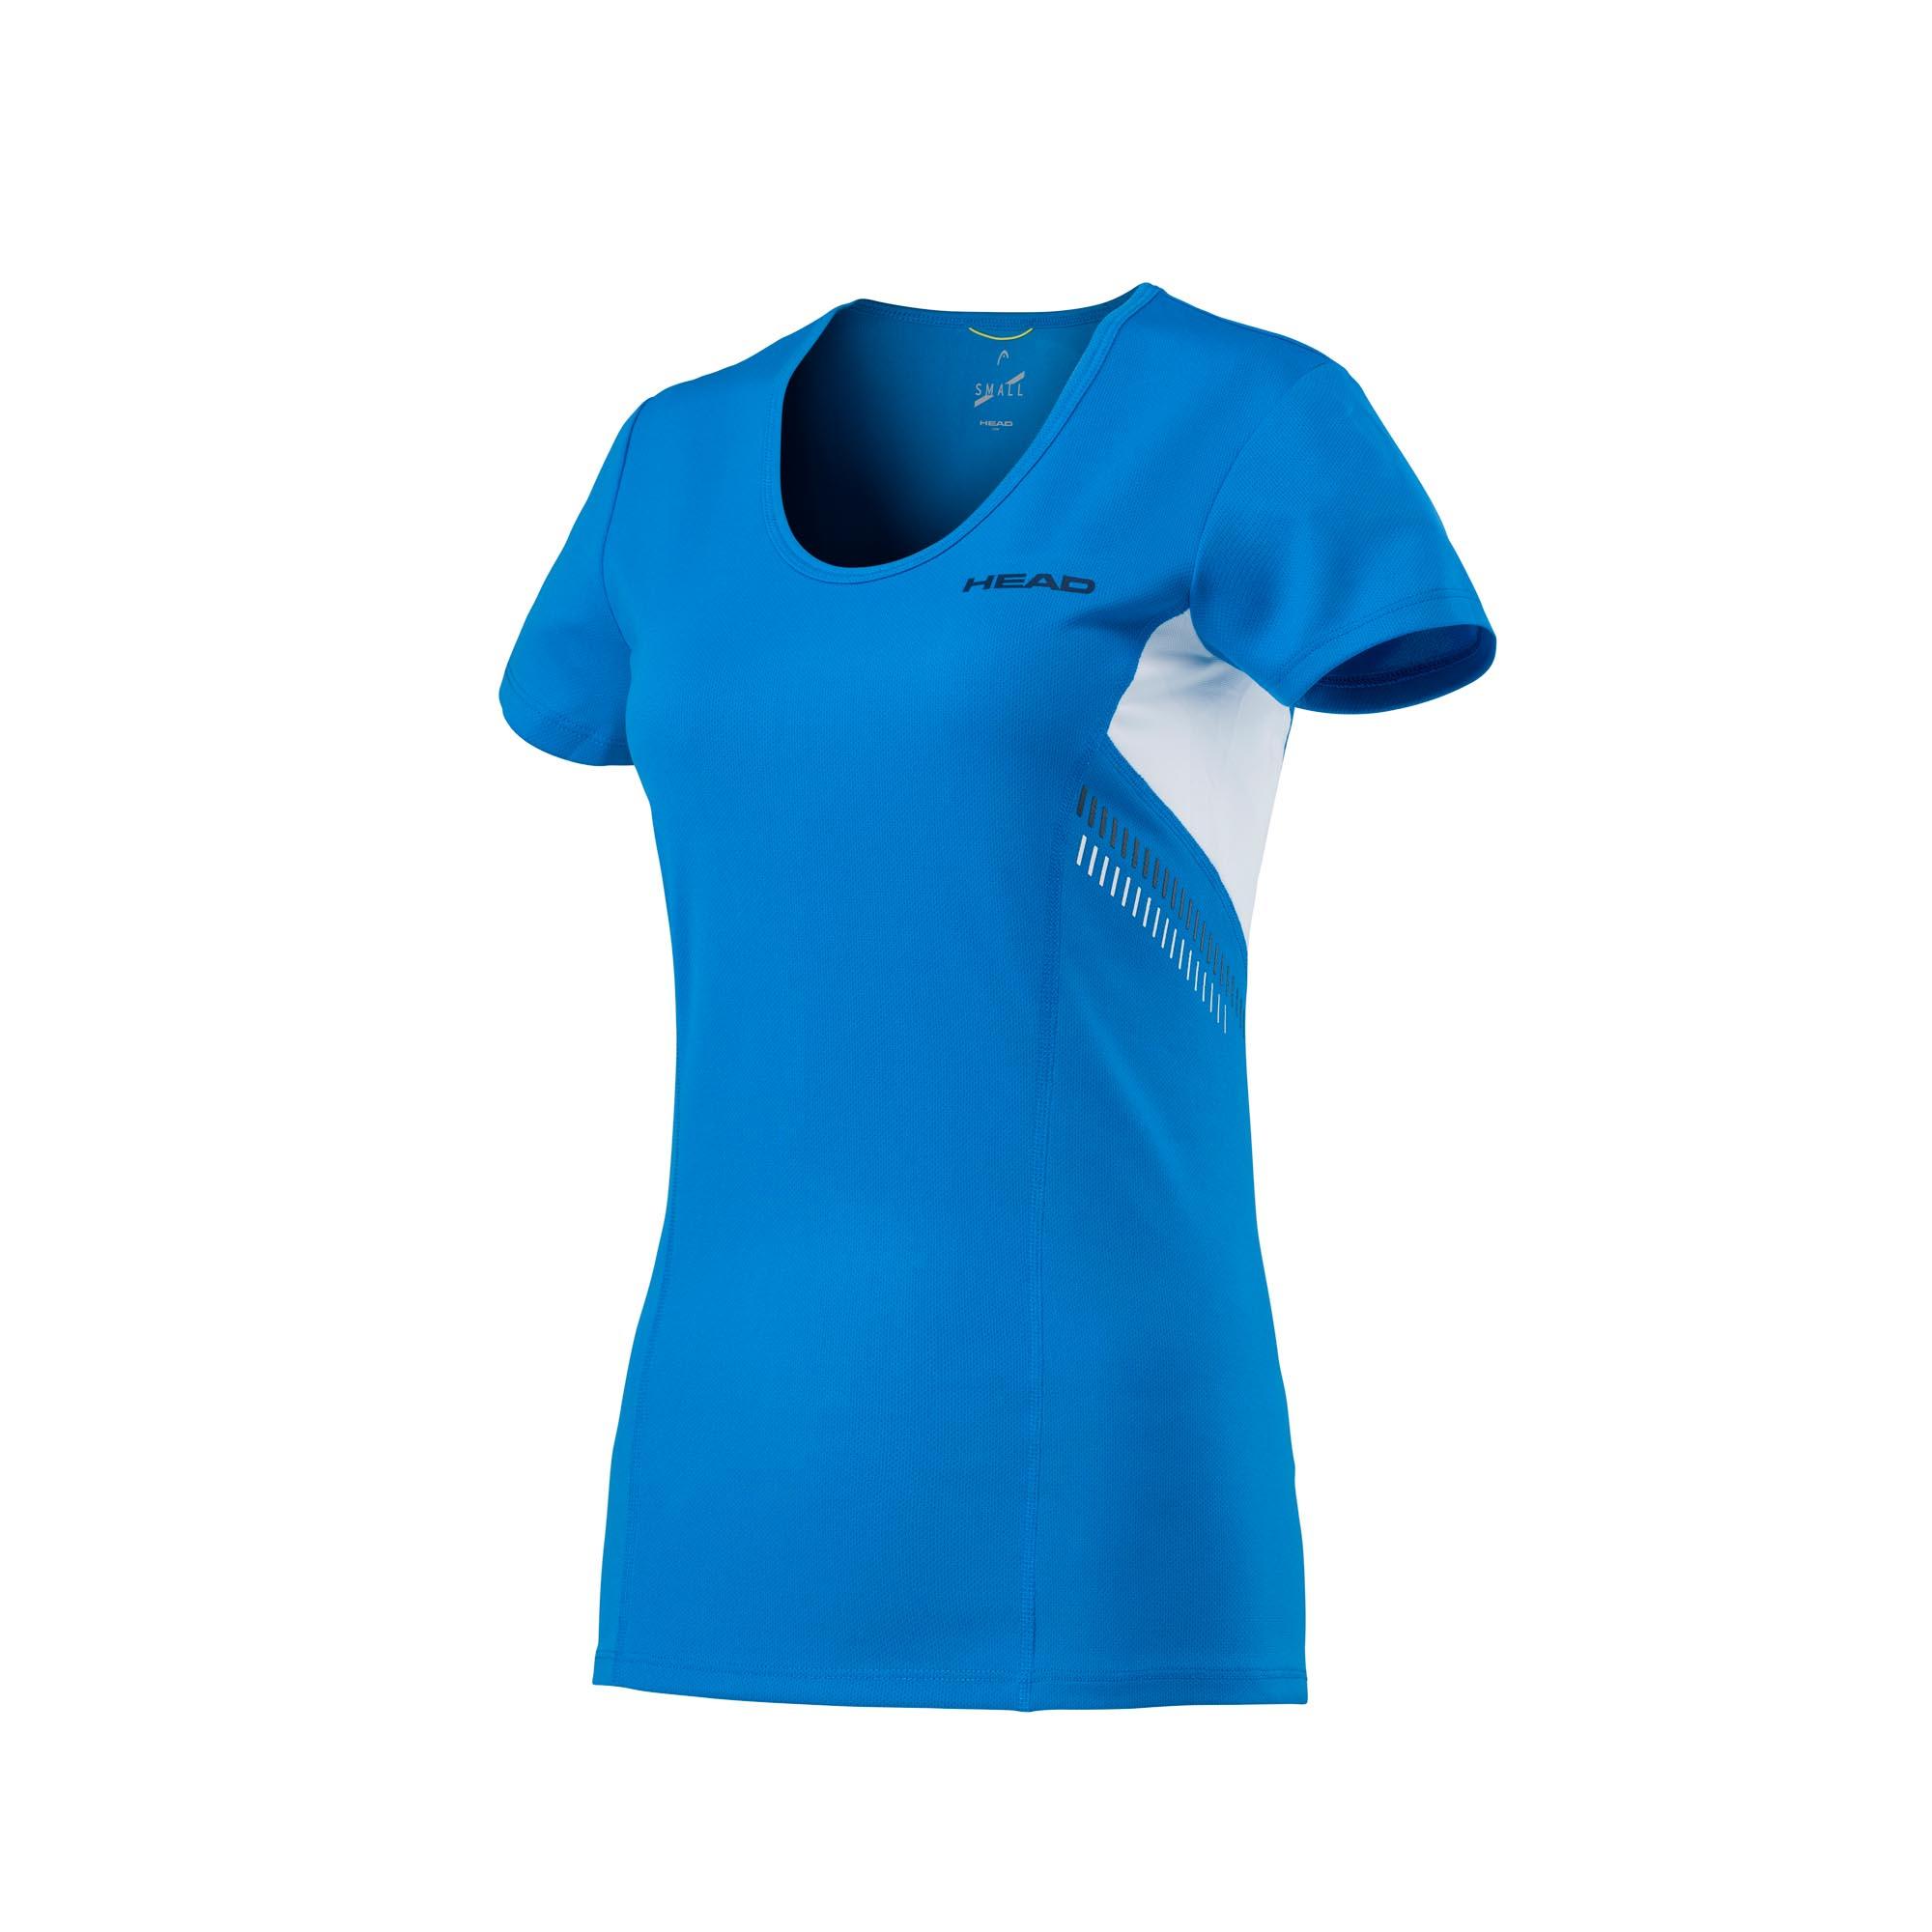 Head Club Technical Ladies T-Shirt - Blue, S